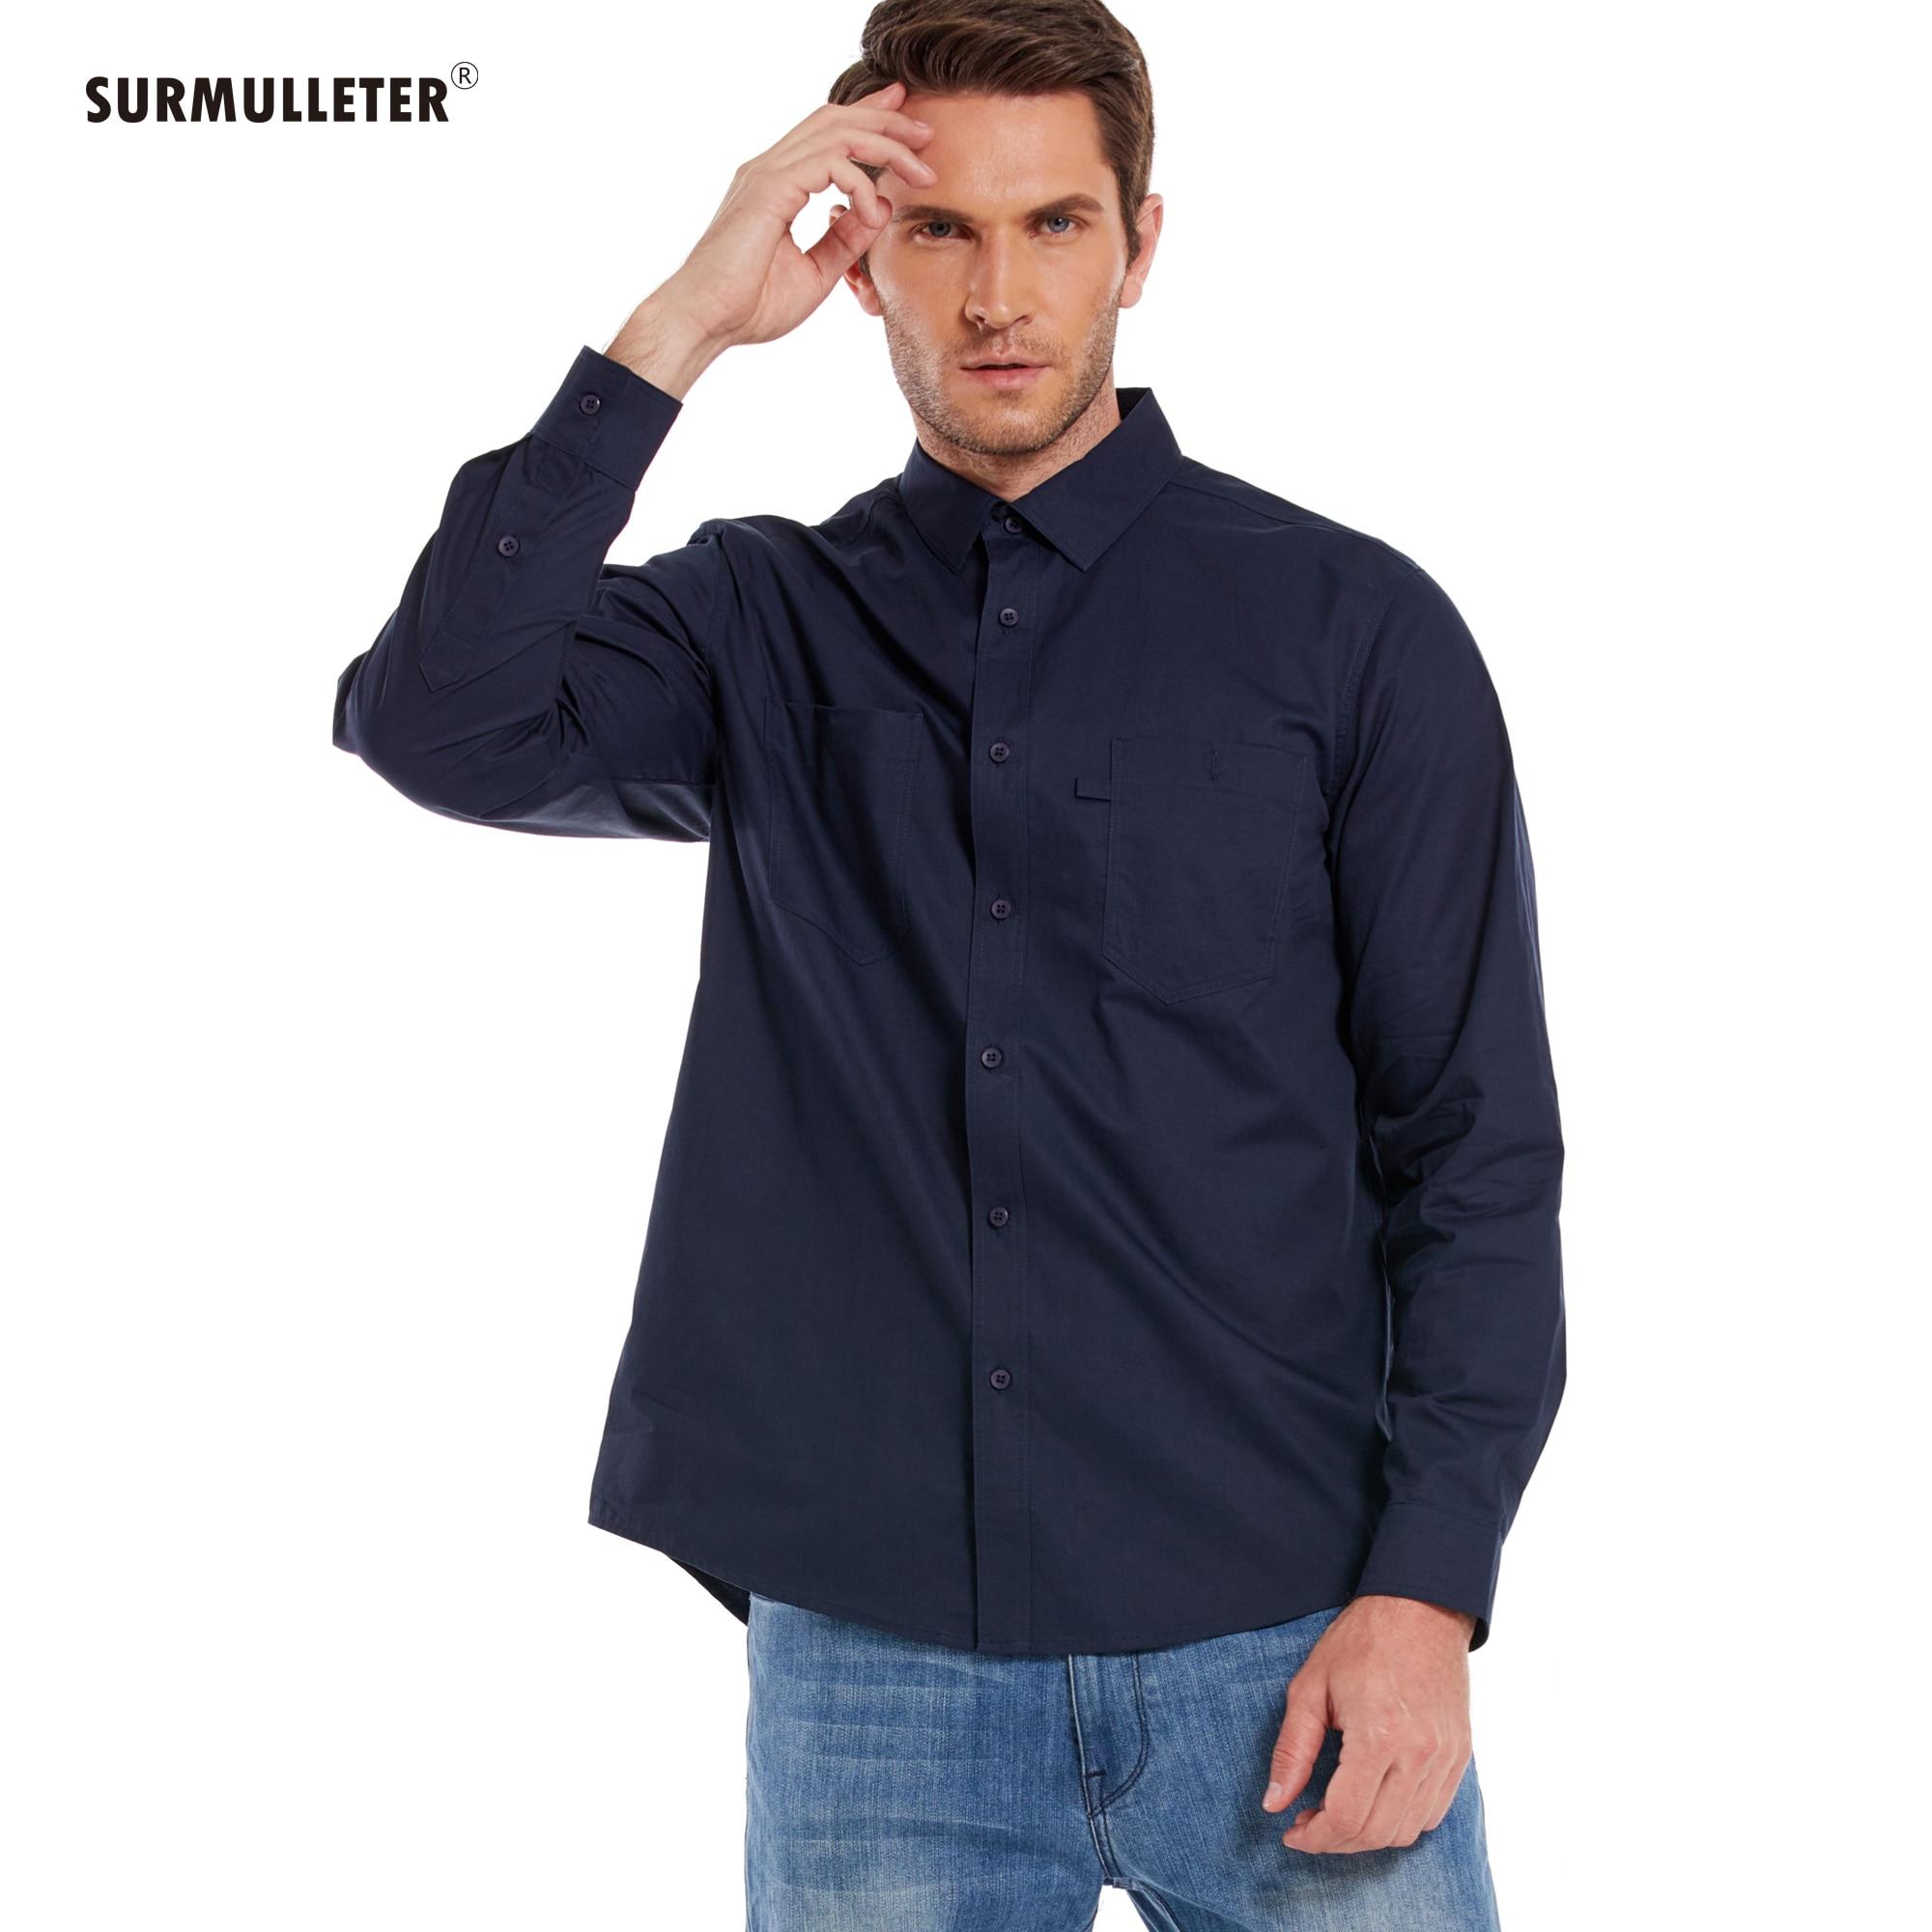 Men Casual Shirt 100%Cotton Long Sleeve safari Plain Style New Fashion Brand SURMULLETER